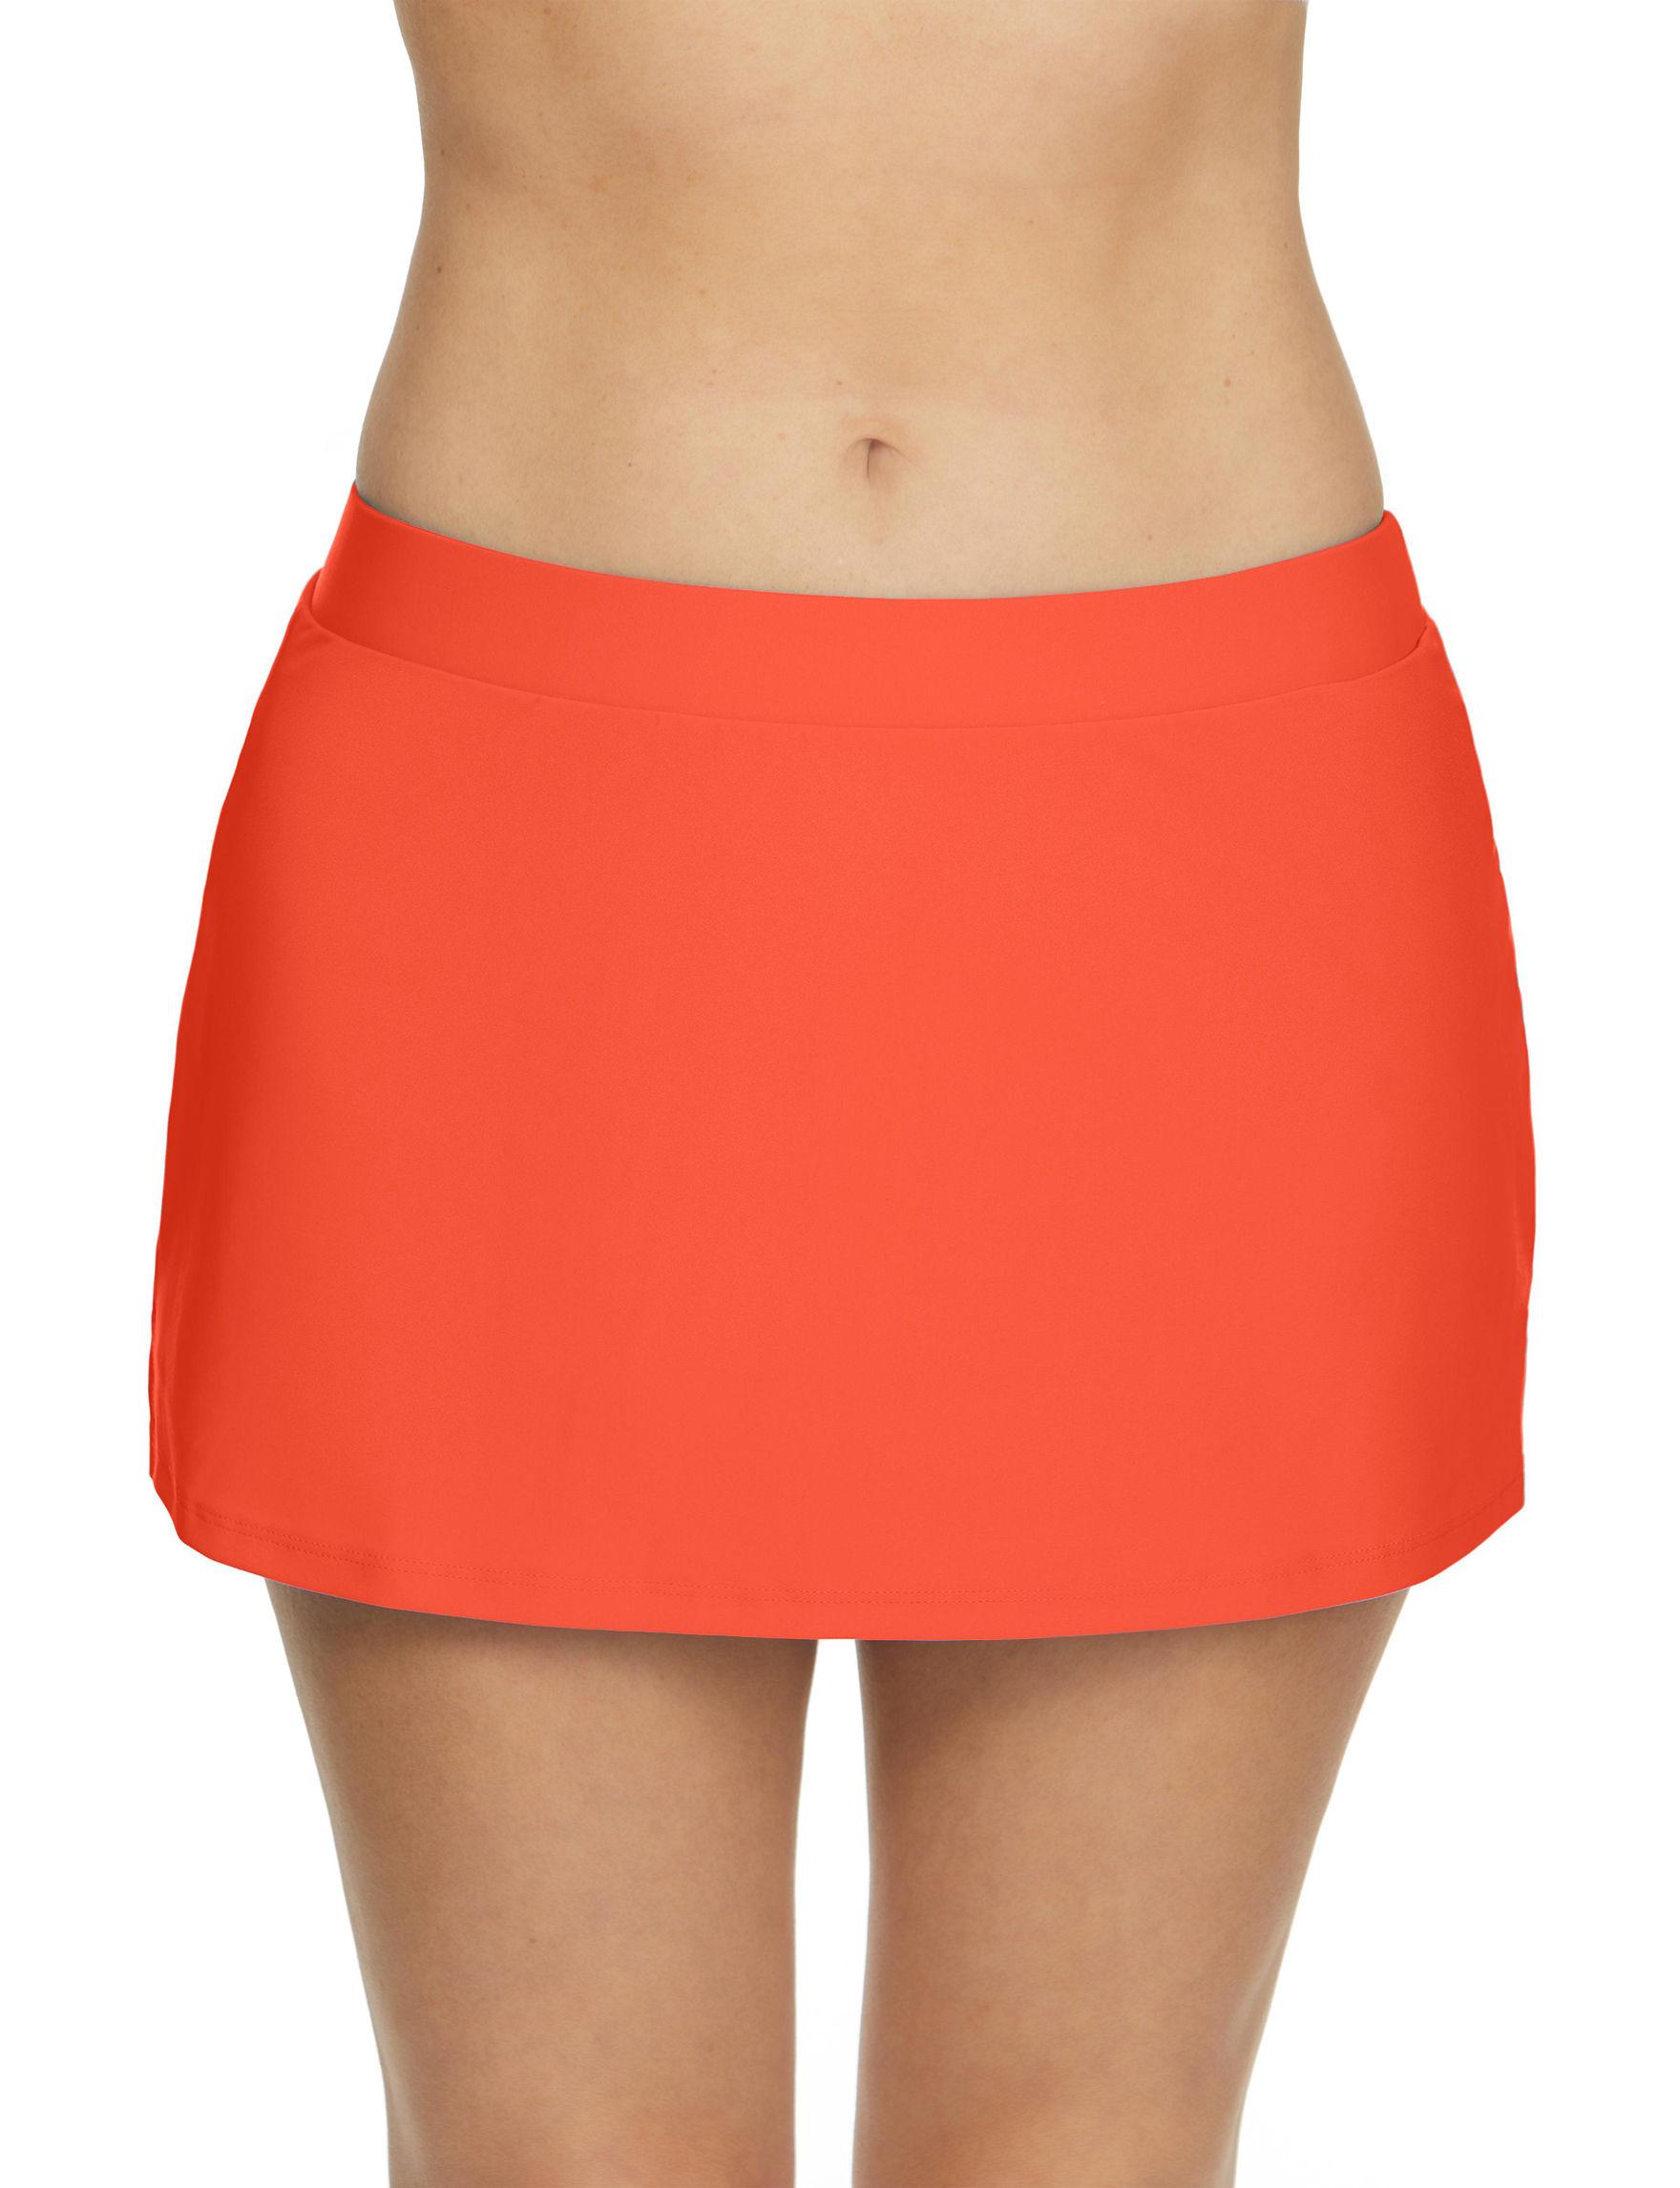 Beach Diva Orange Swimsuit Bottoms Skirtini